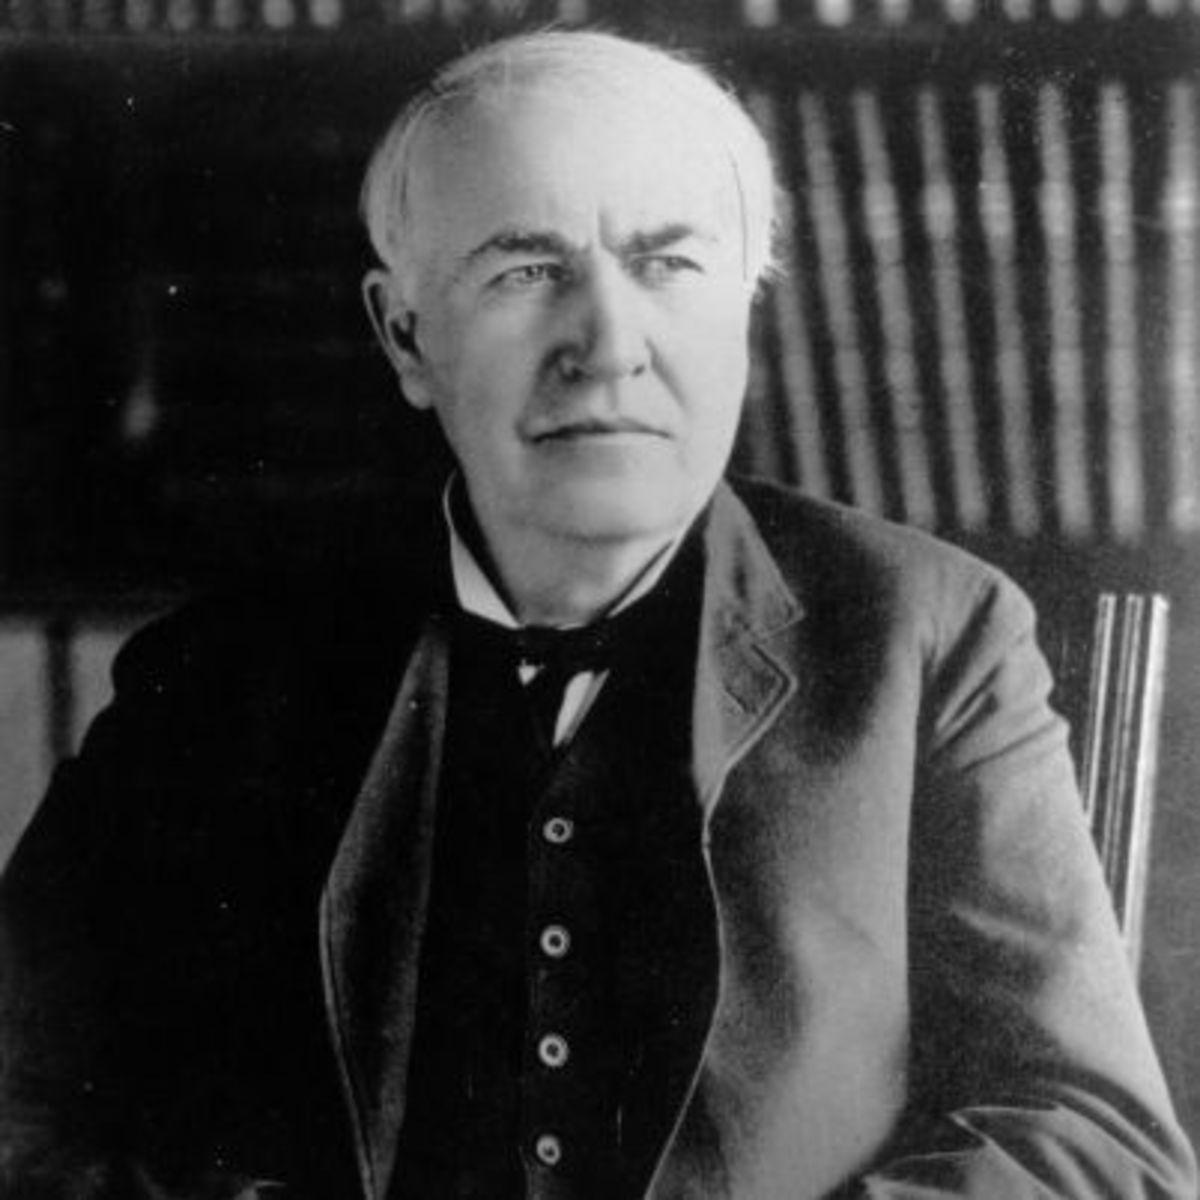 10. Thomas Edison – Inventor